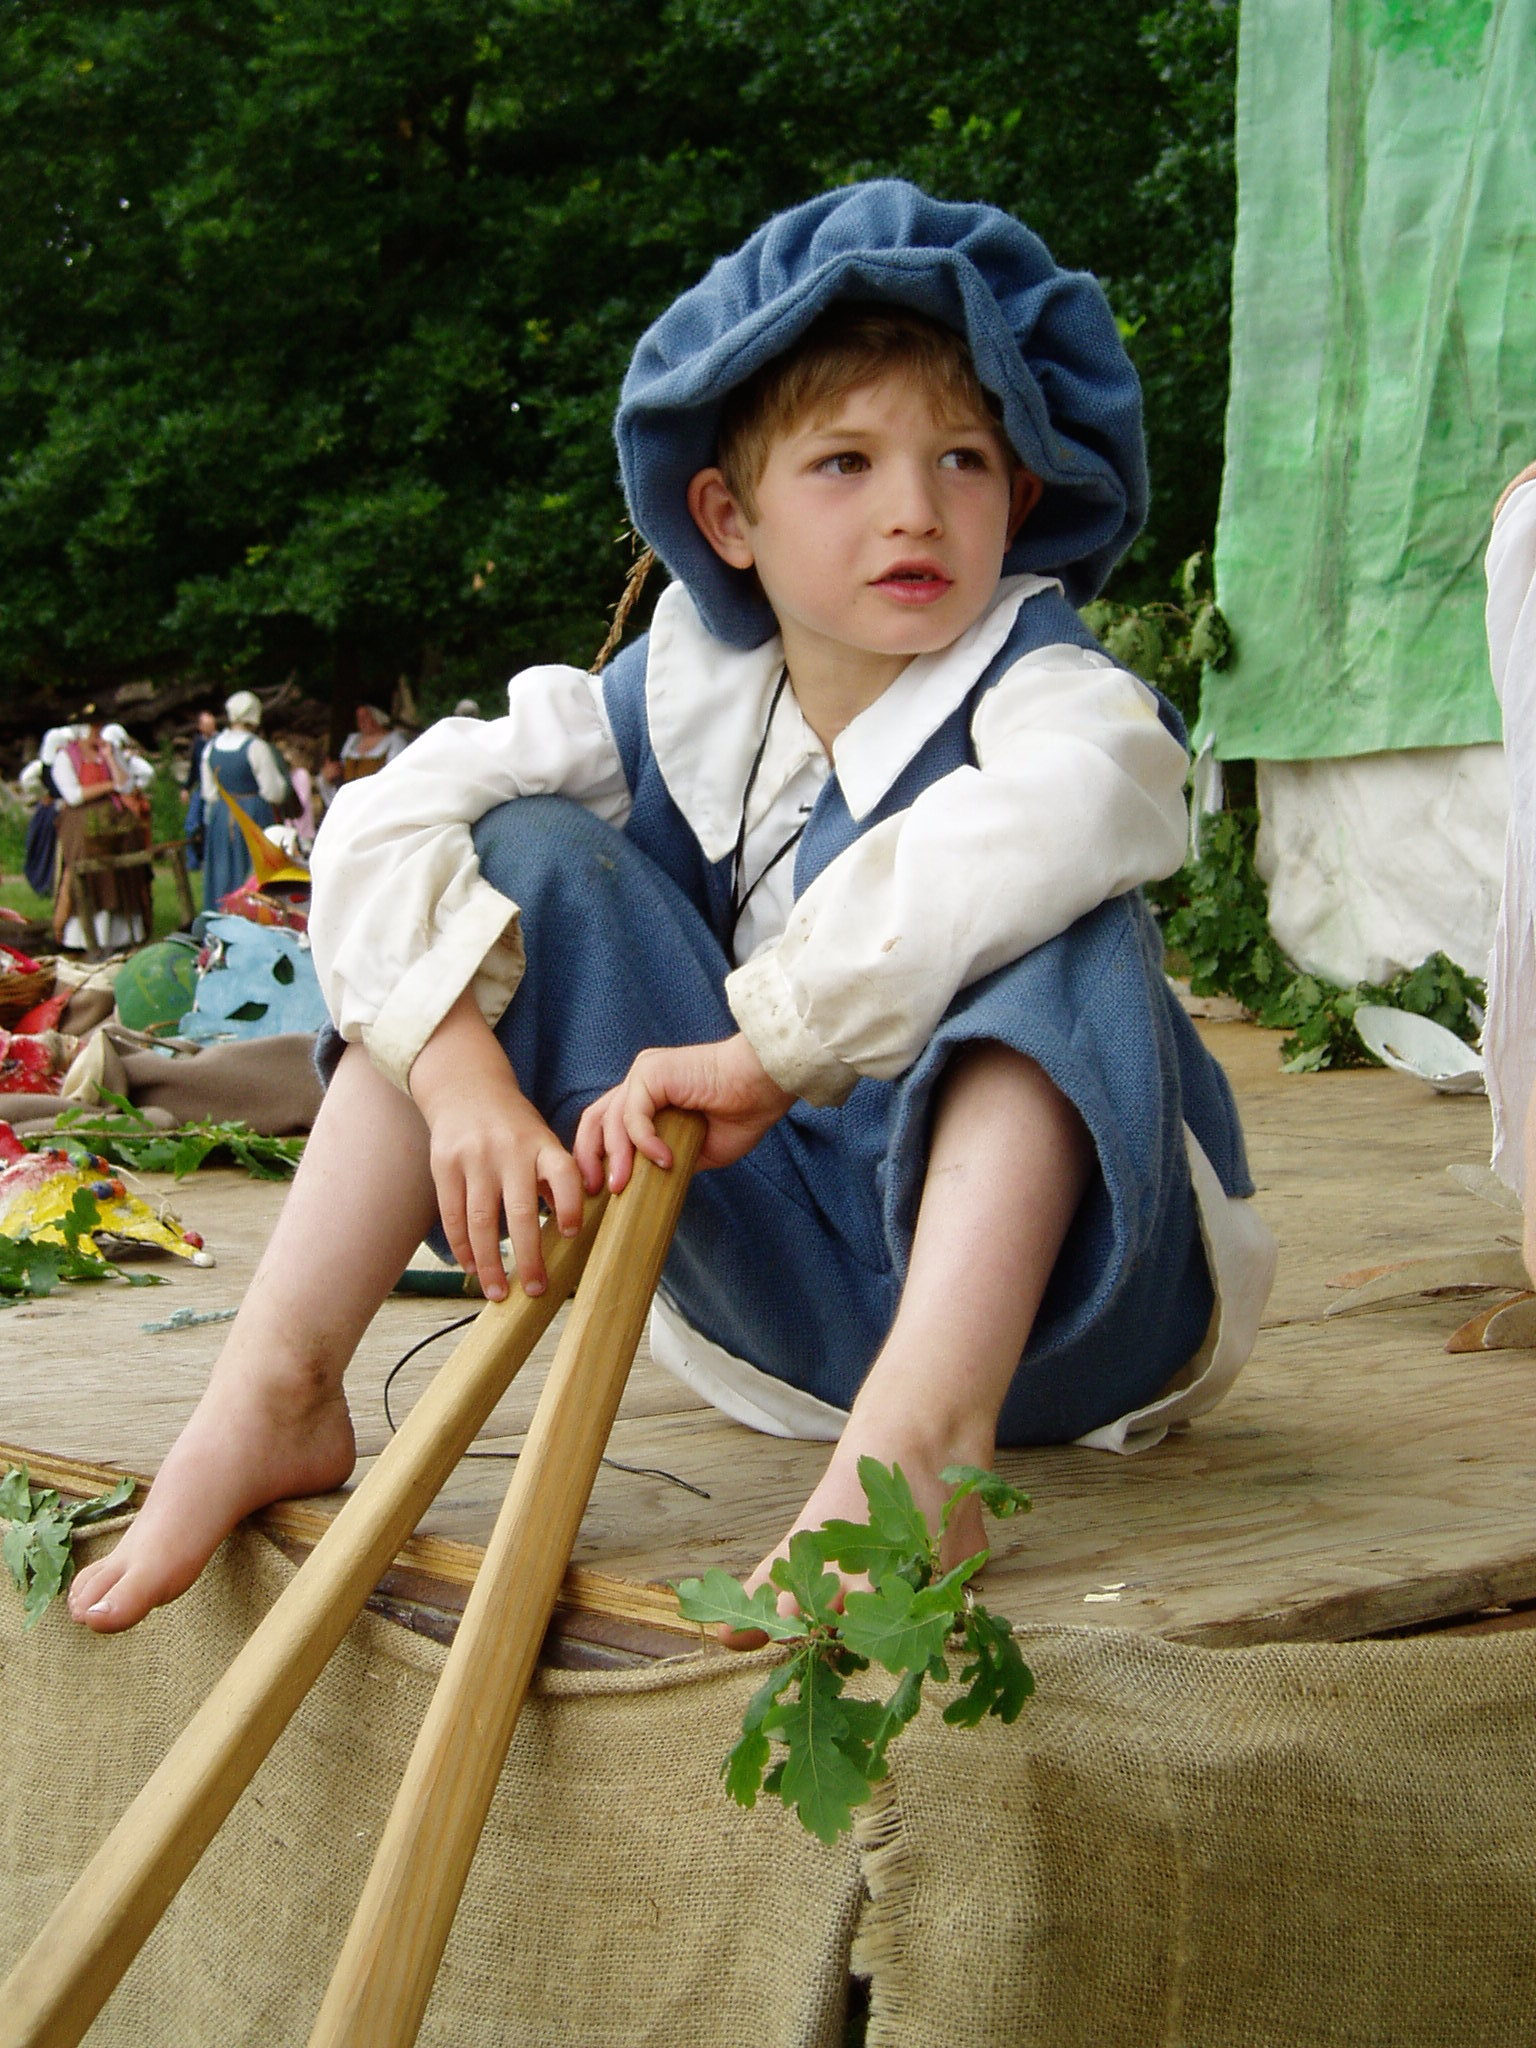 2-07-2005 Kentwell.jpg